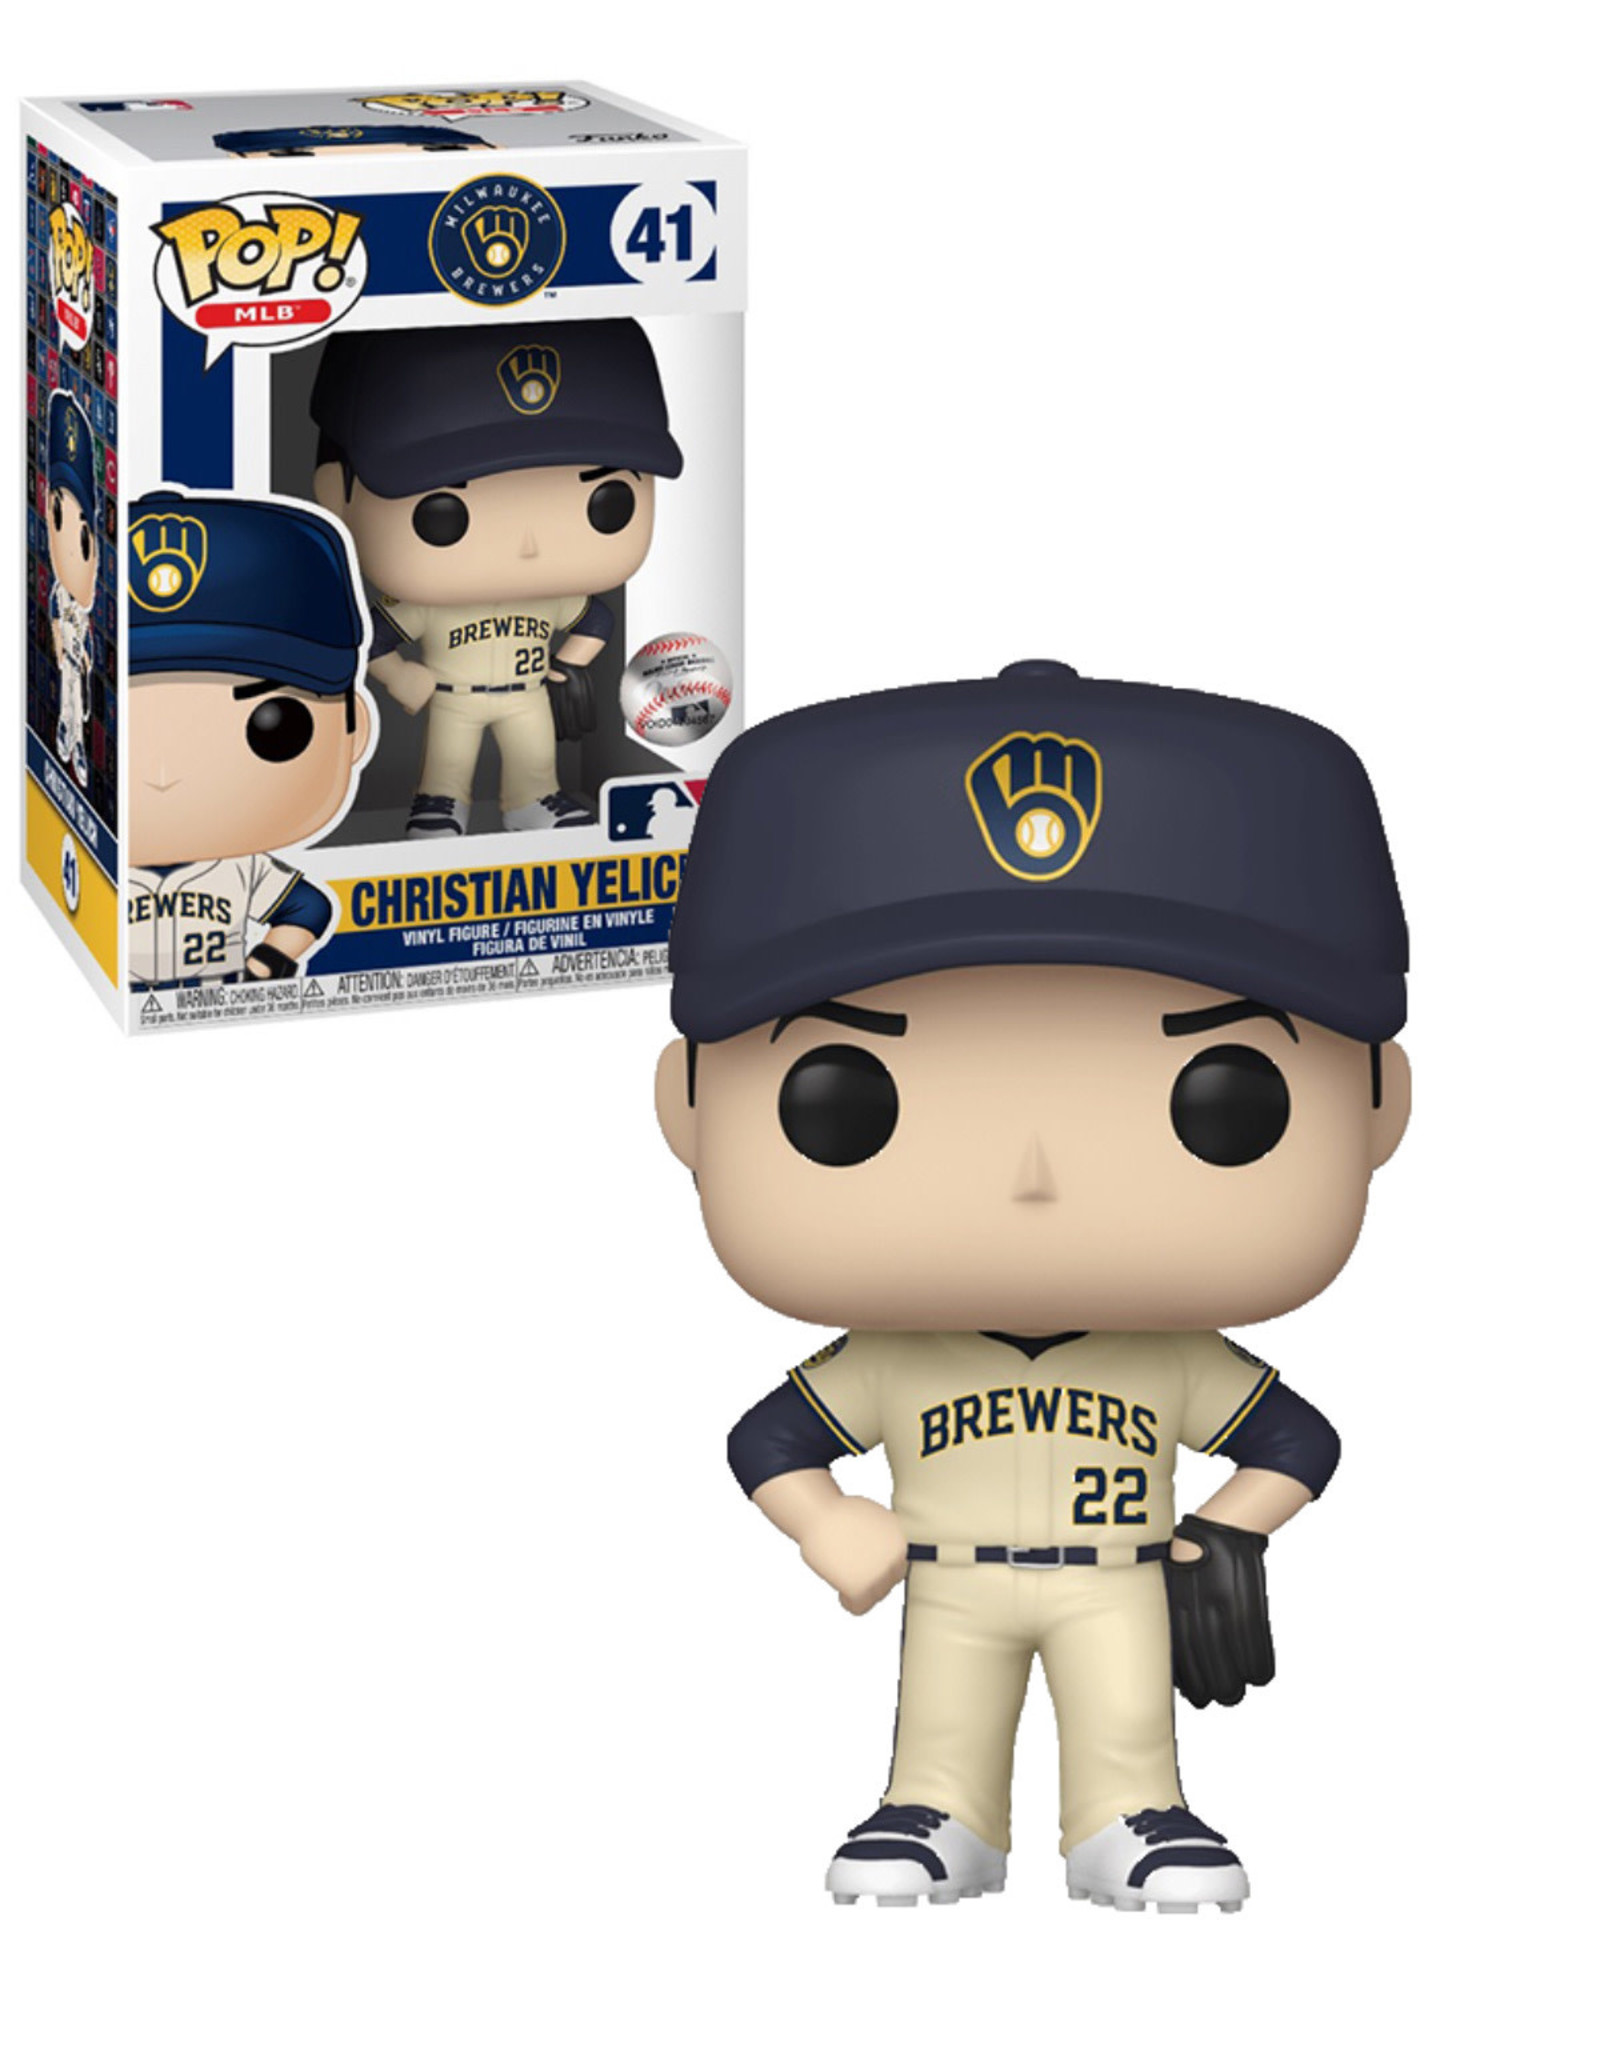 MLB Brewers 41 ( Funko Pop ) Christian Yelich